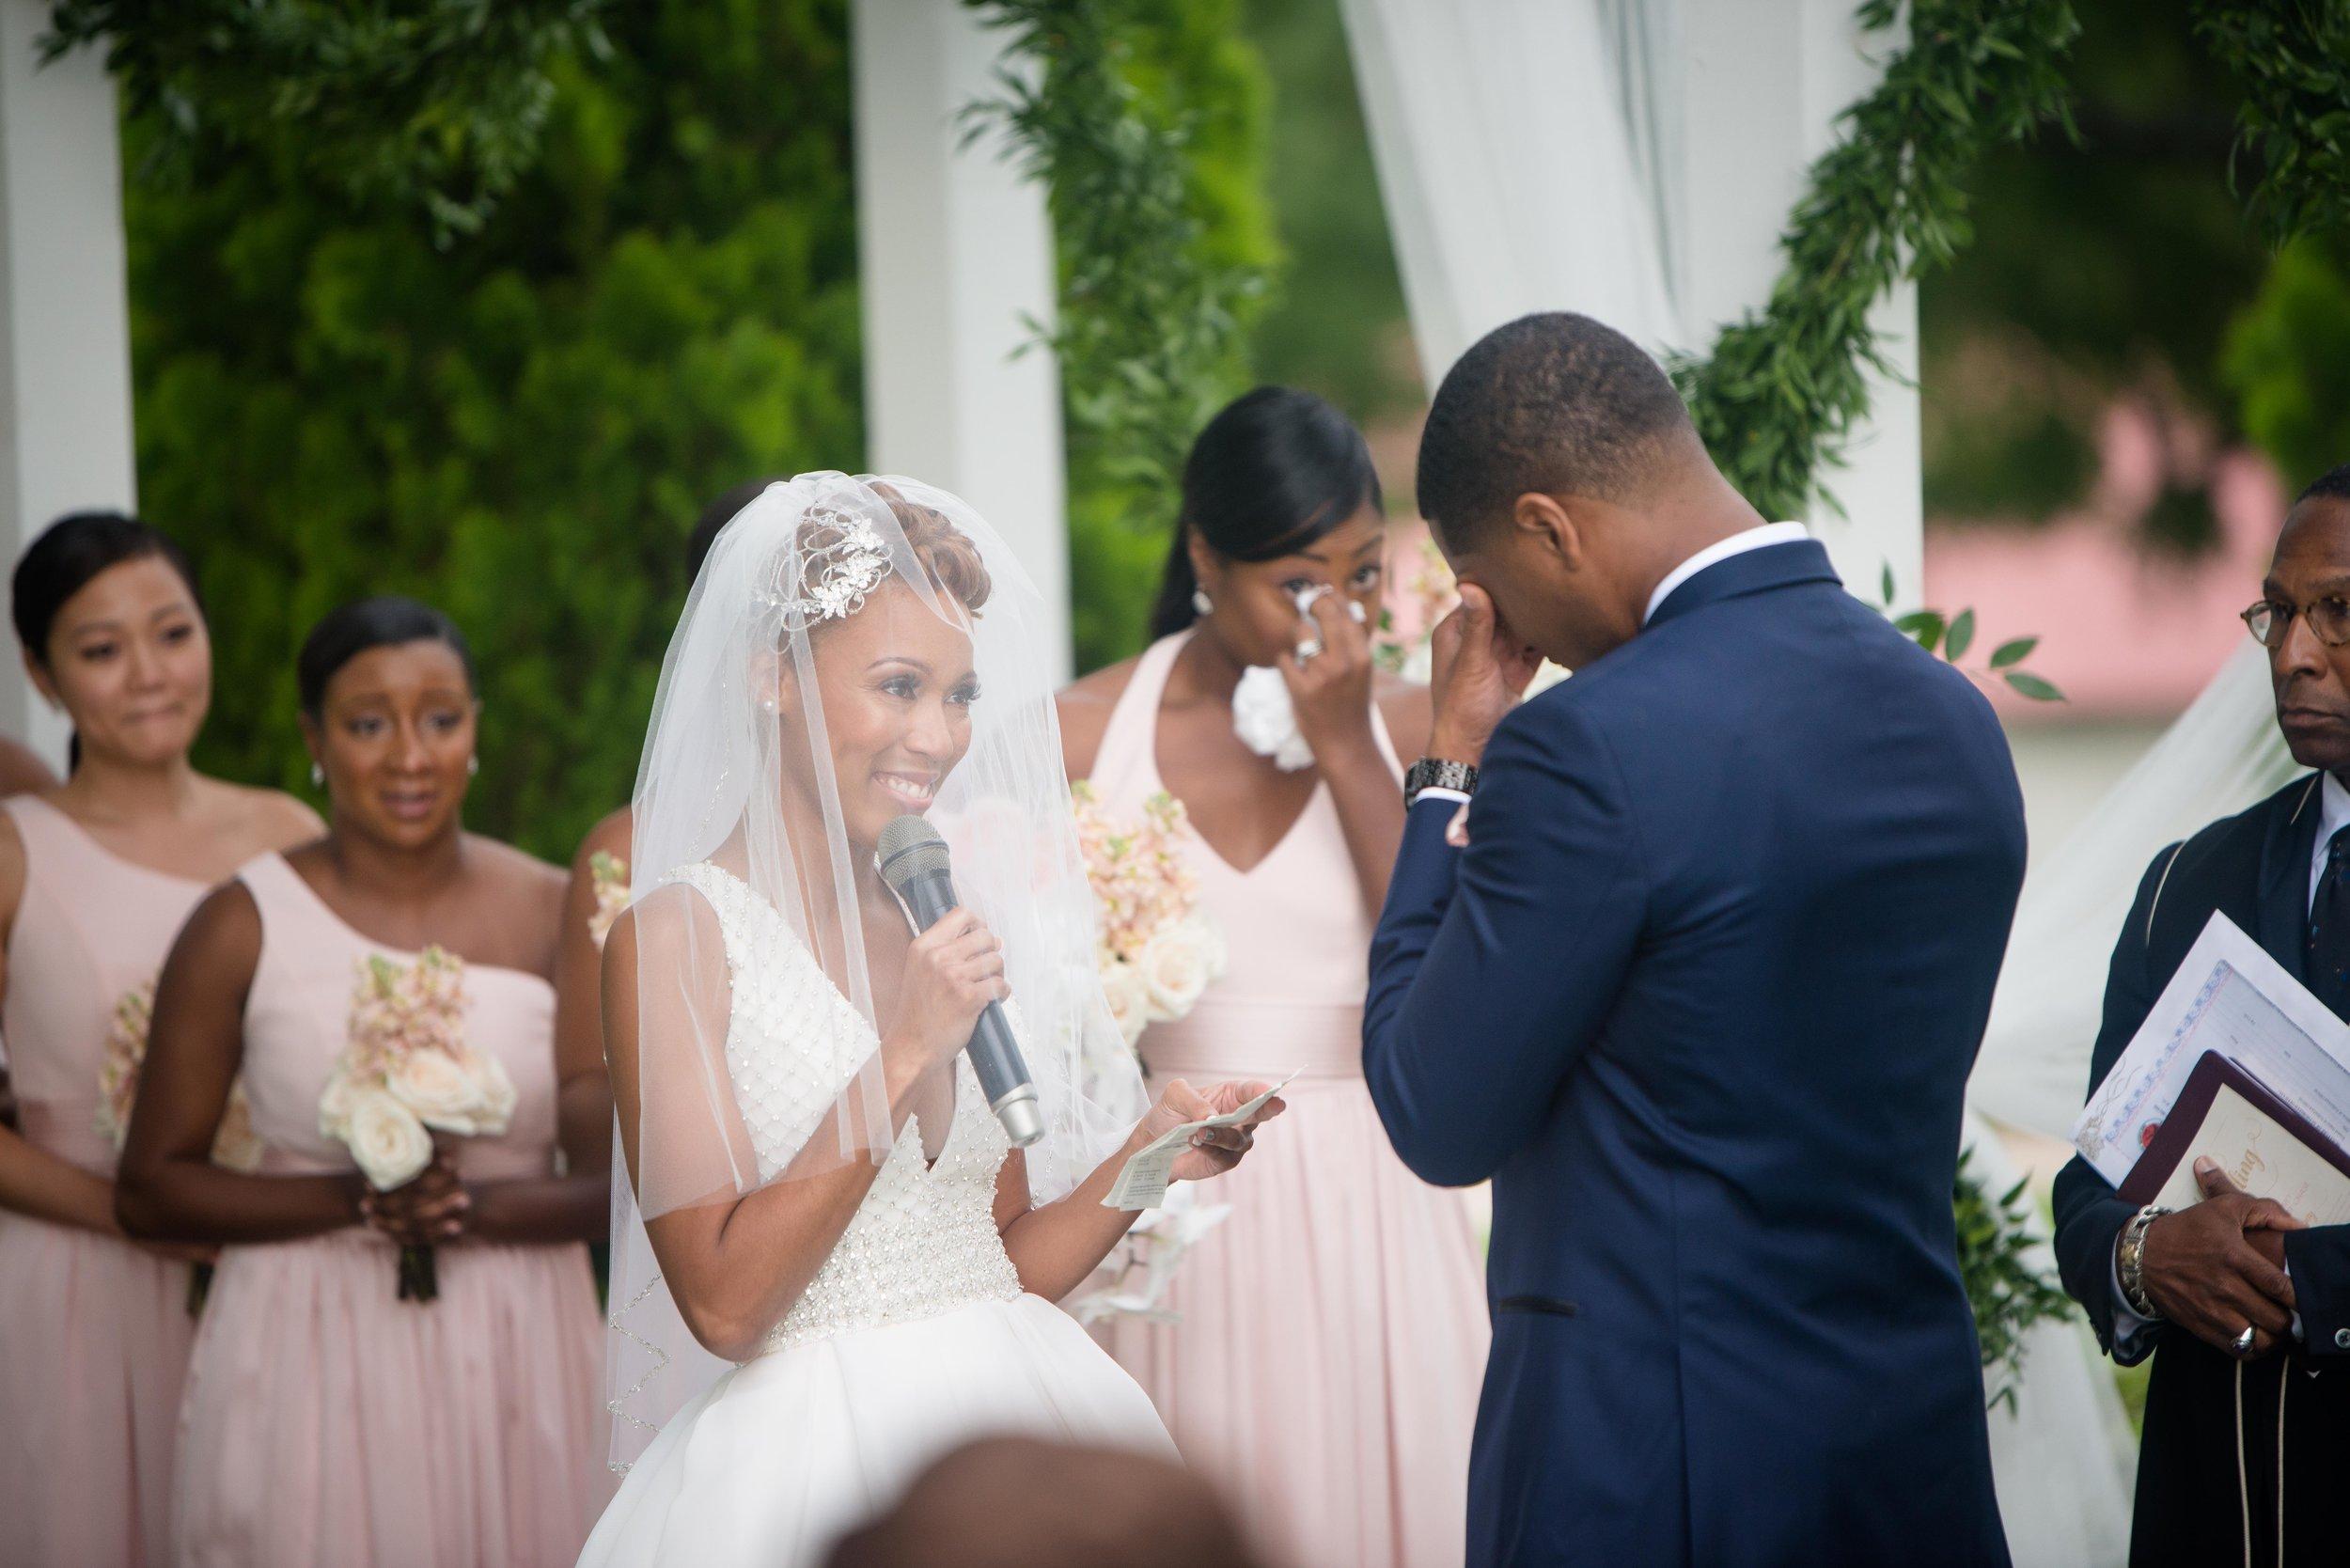 Chase Wedding - 2017-43.JPG